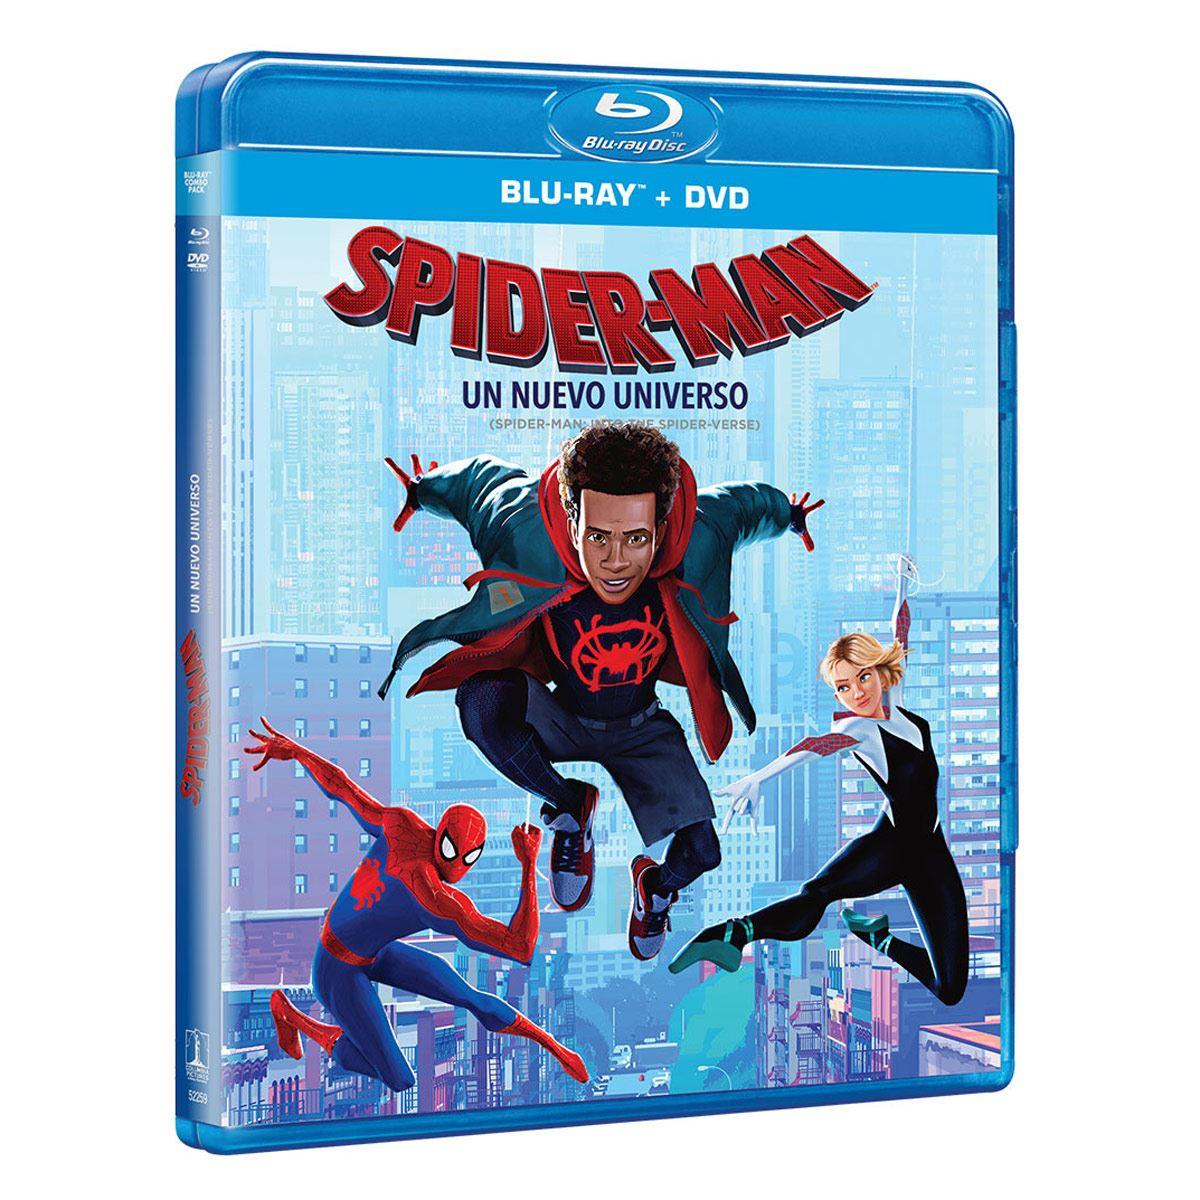 BR+ DVD Spiderman Un Nuevo Universo